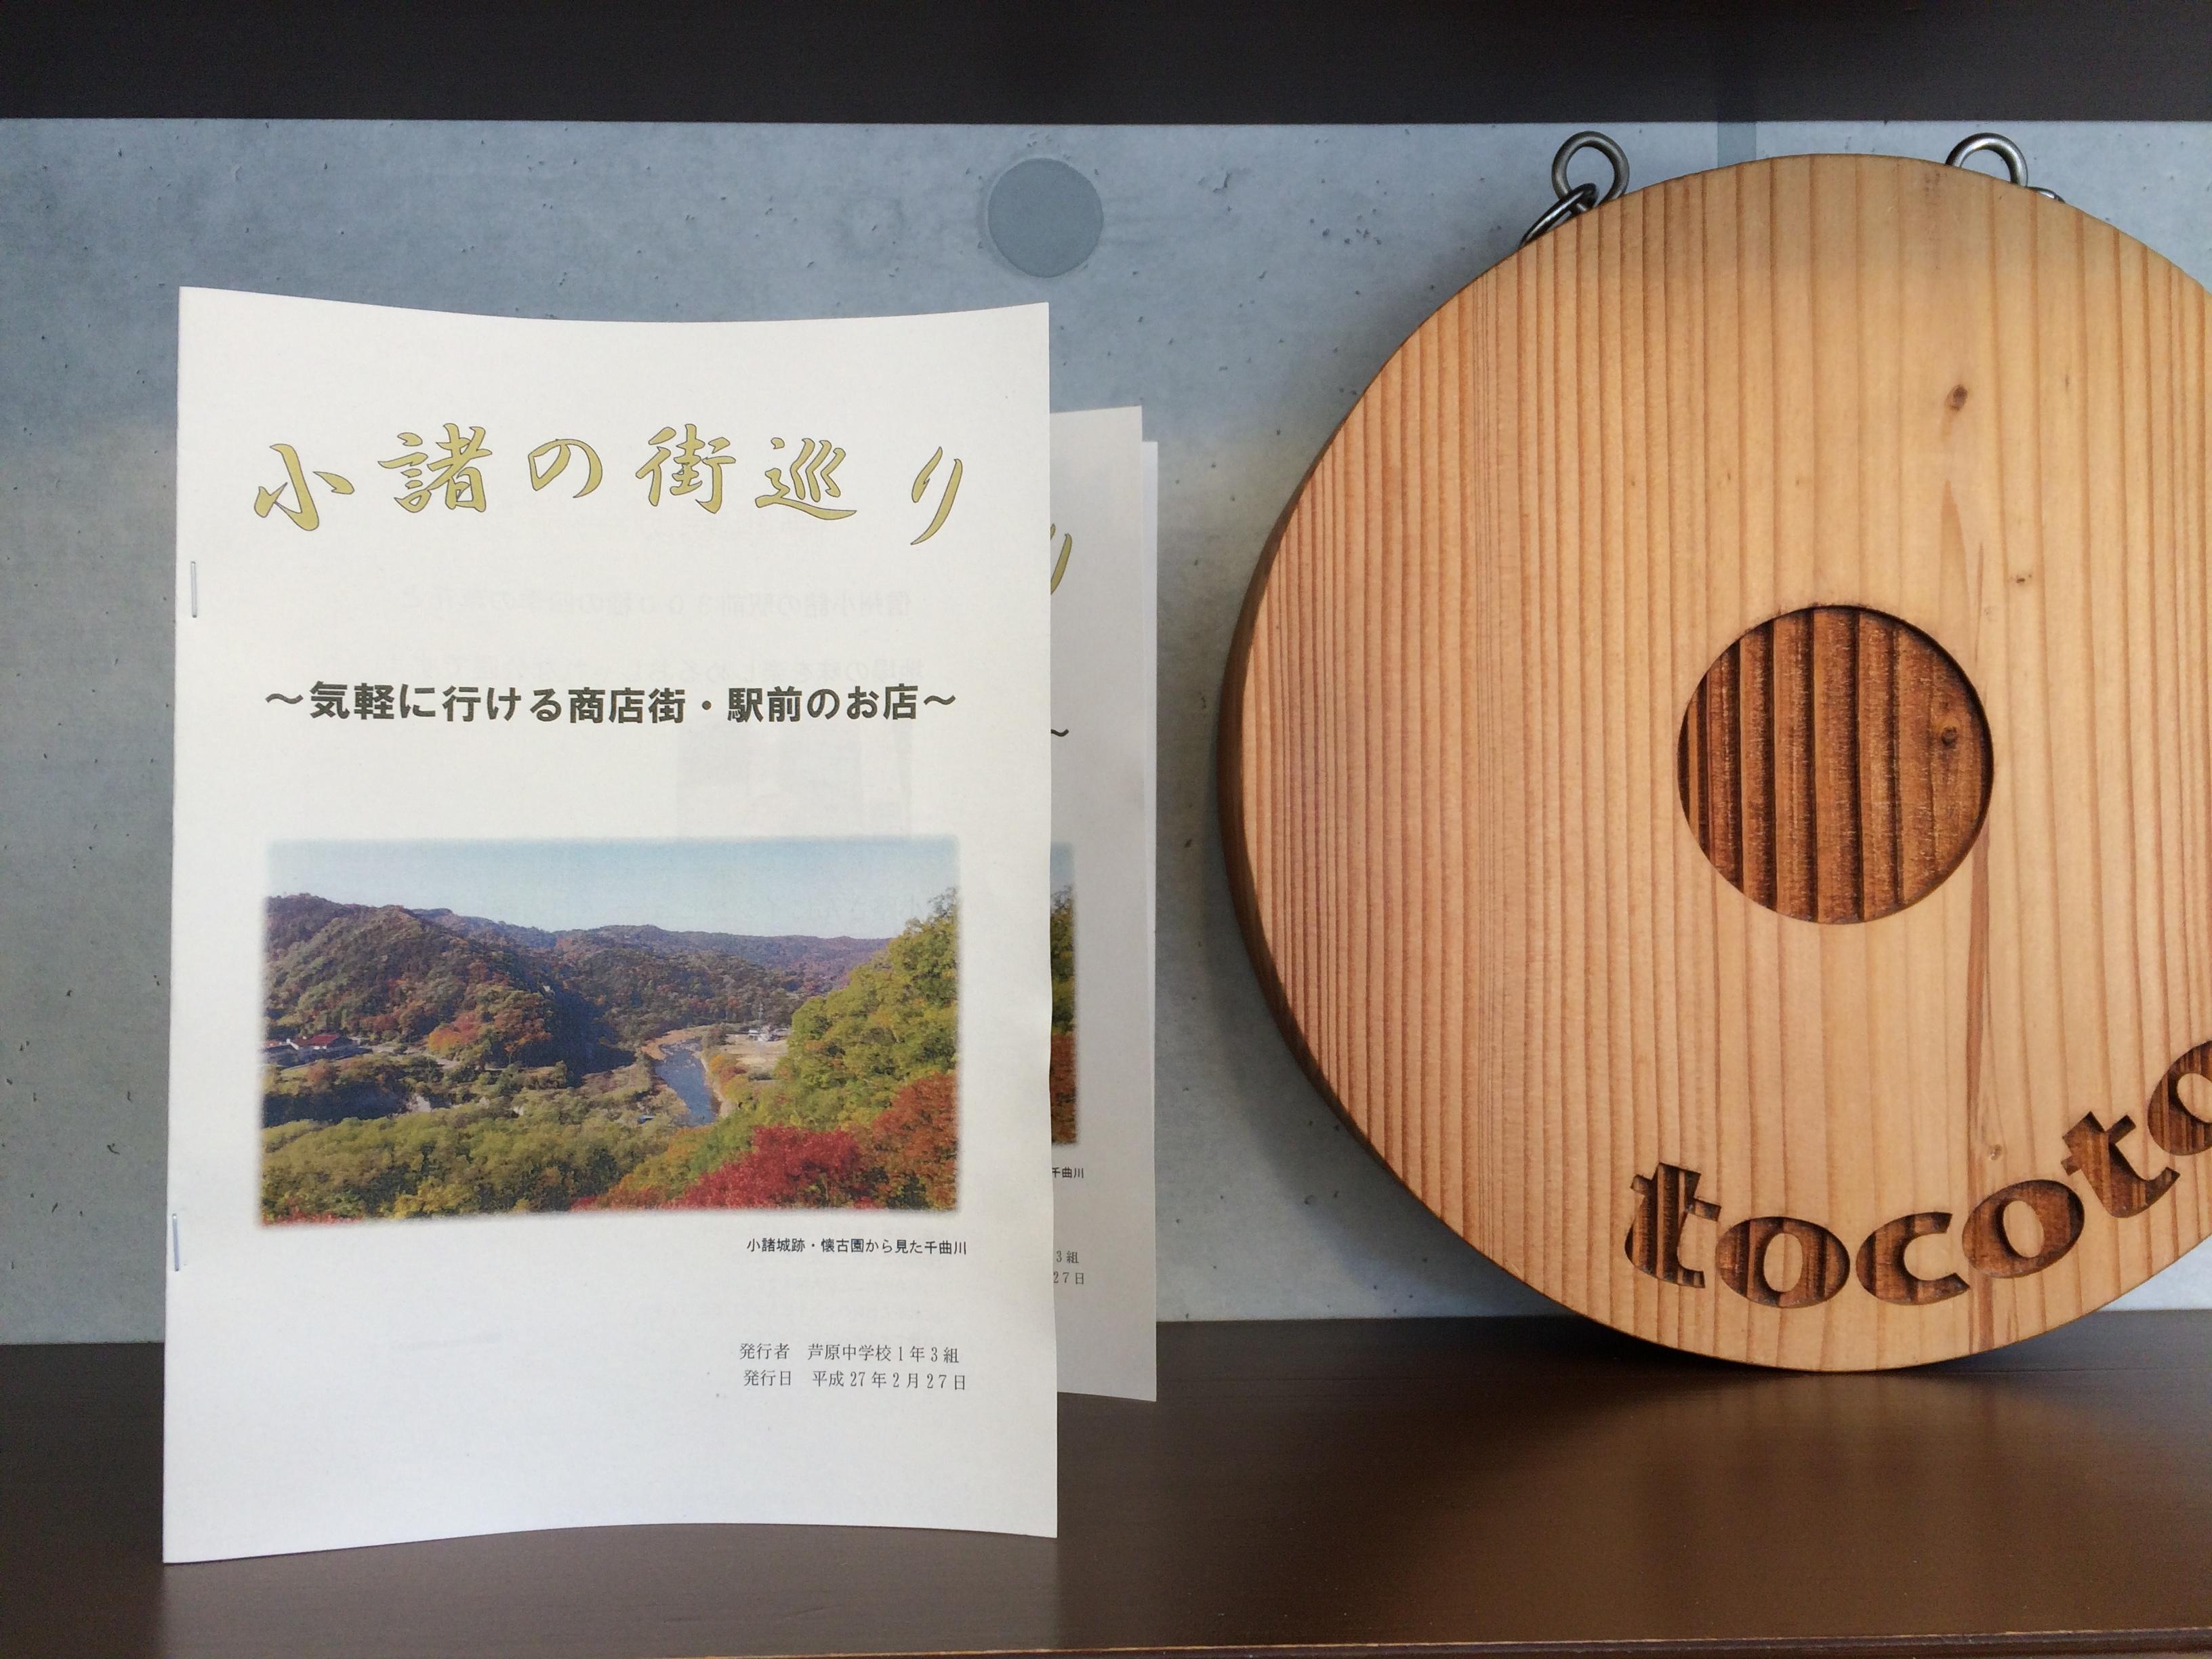 小諸の街巡り 芦原中学校1−3発行